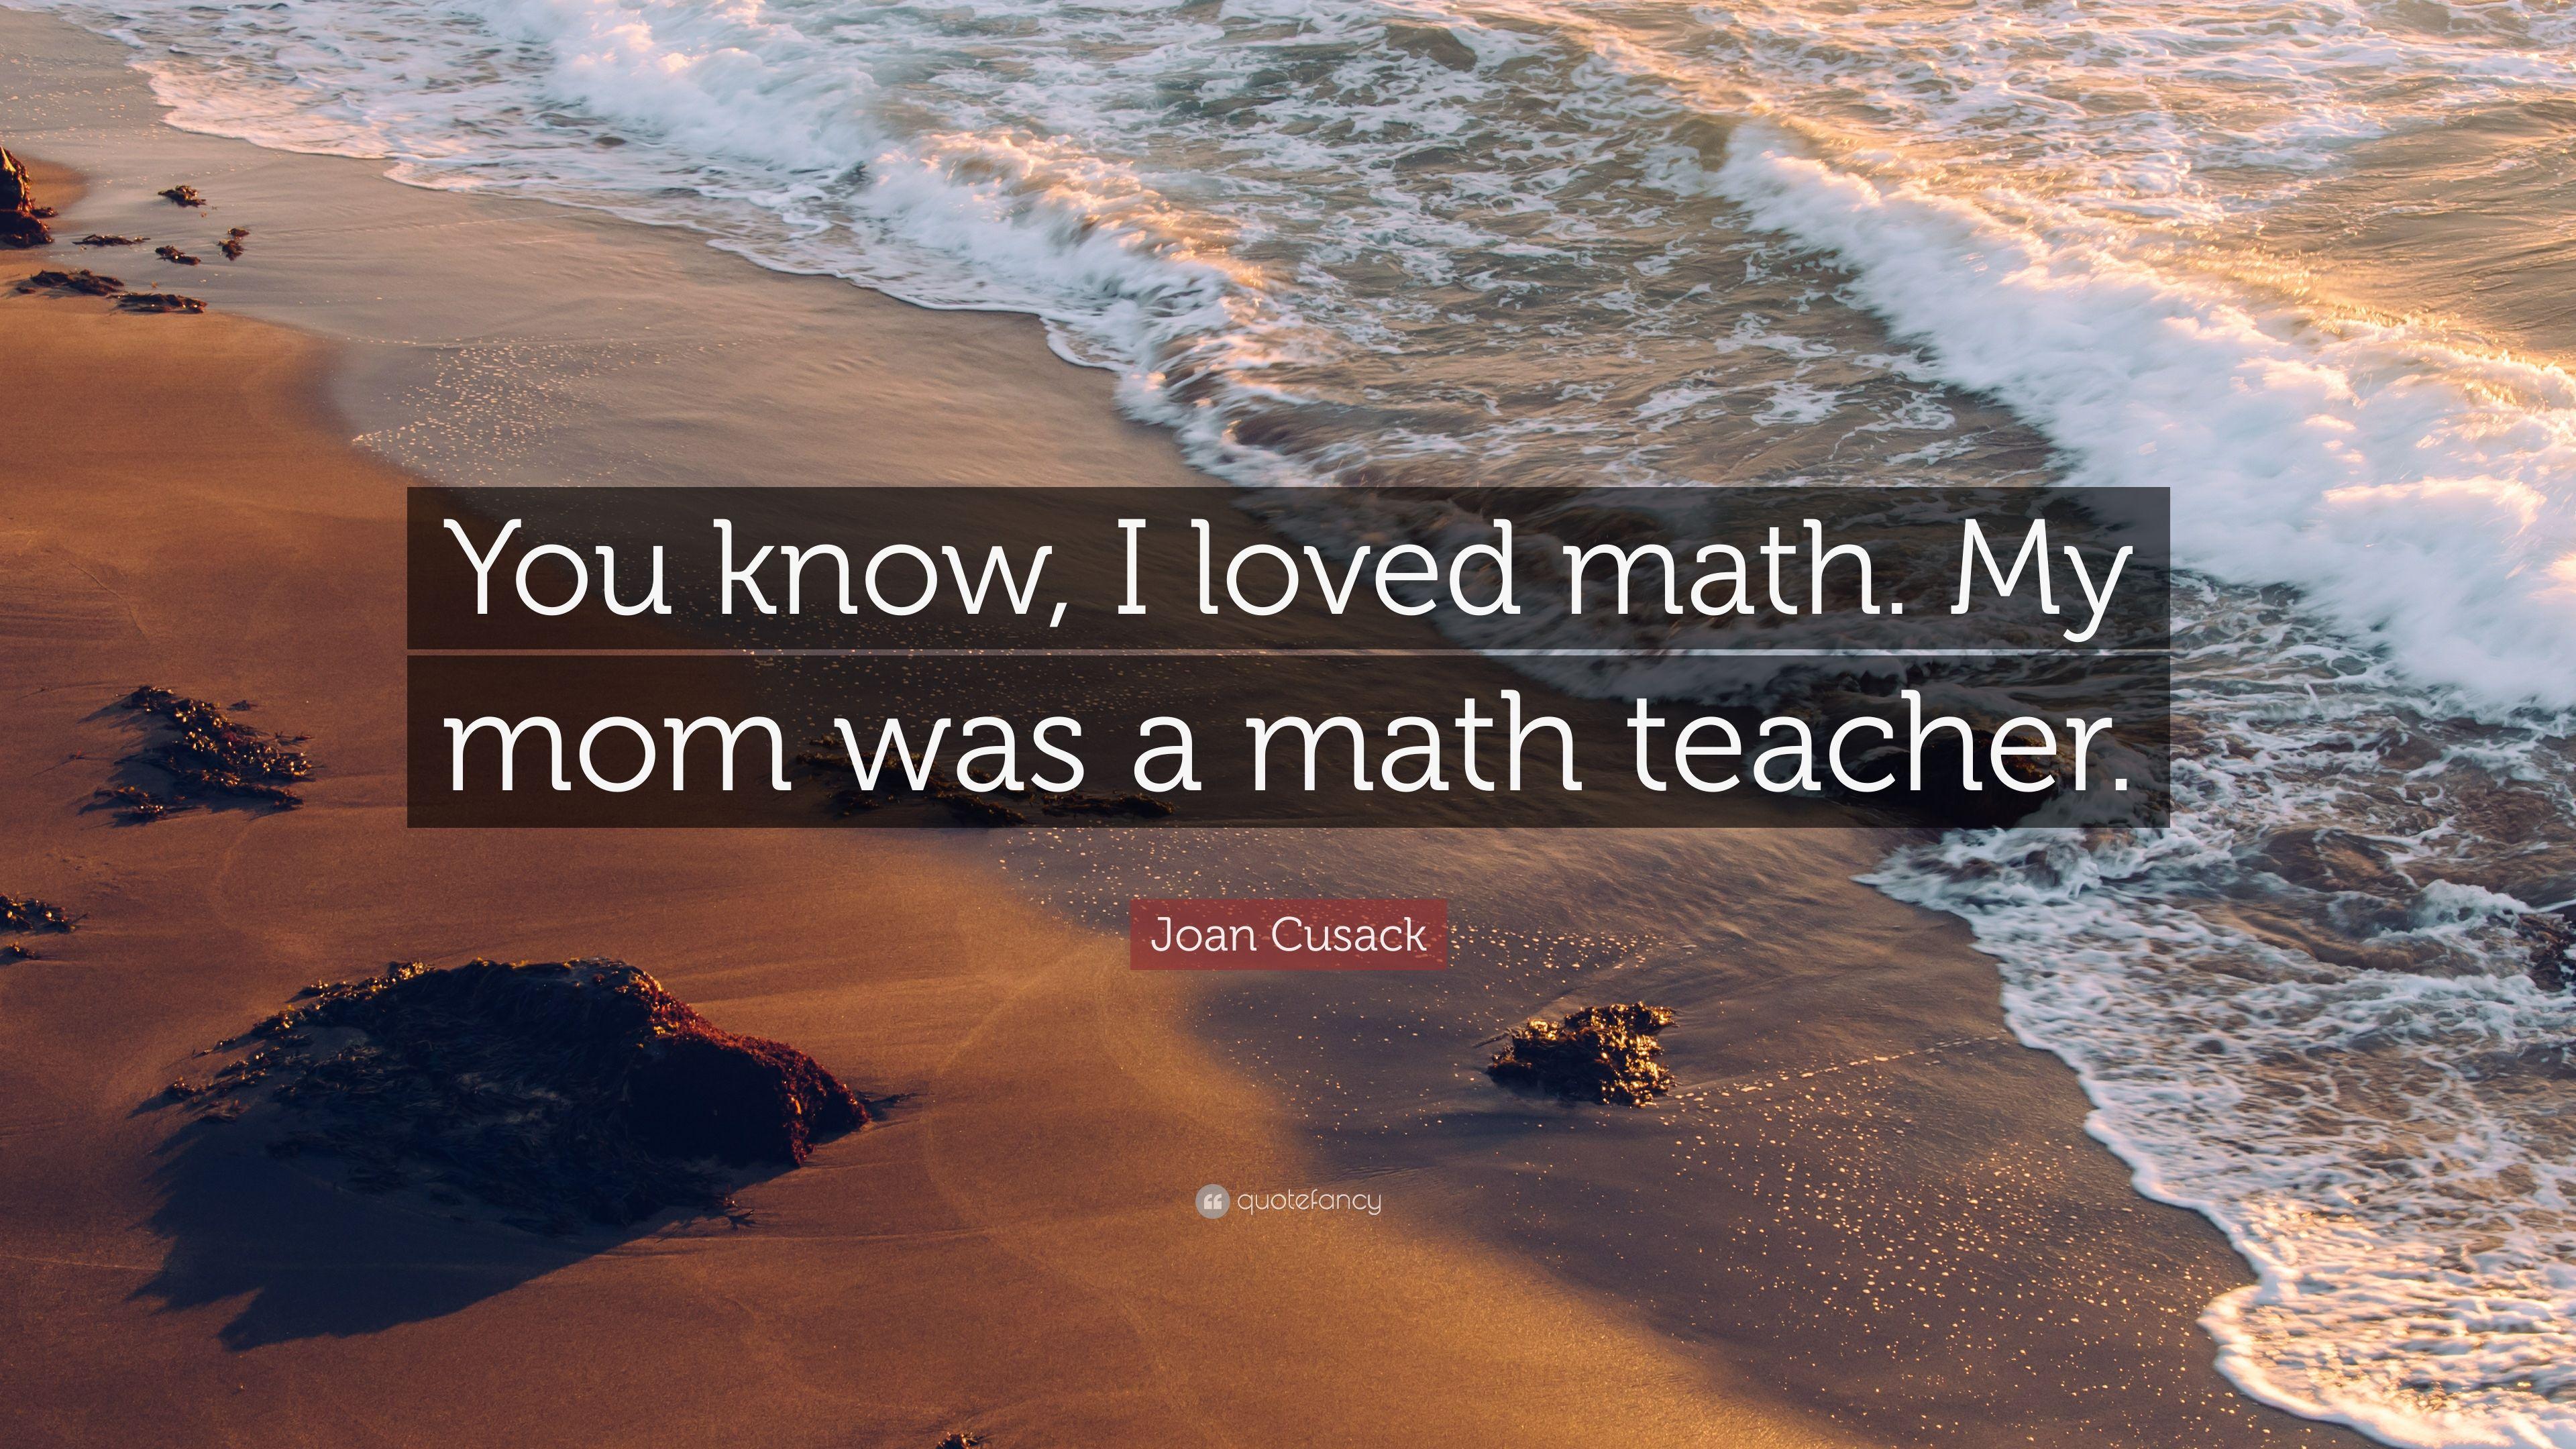 Math Teacher Quotes Twitter thumbnail